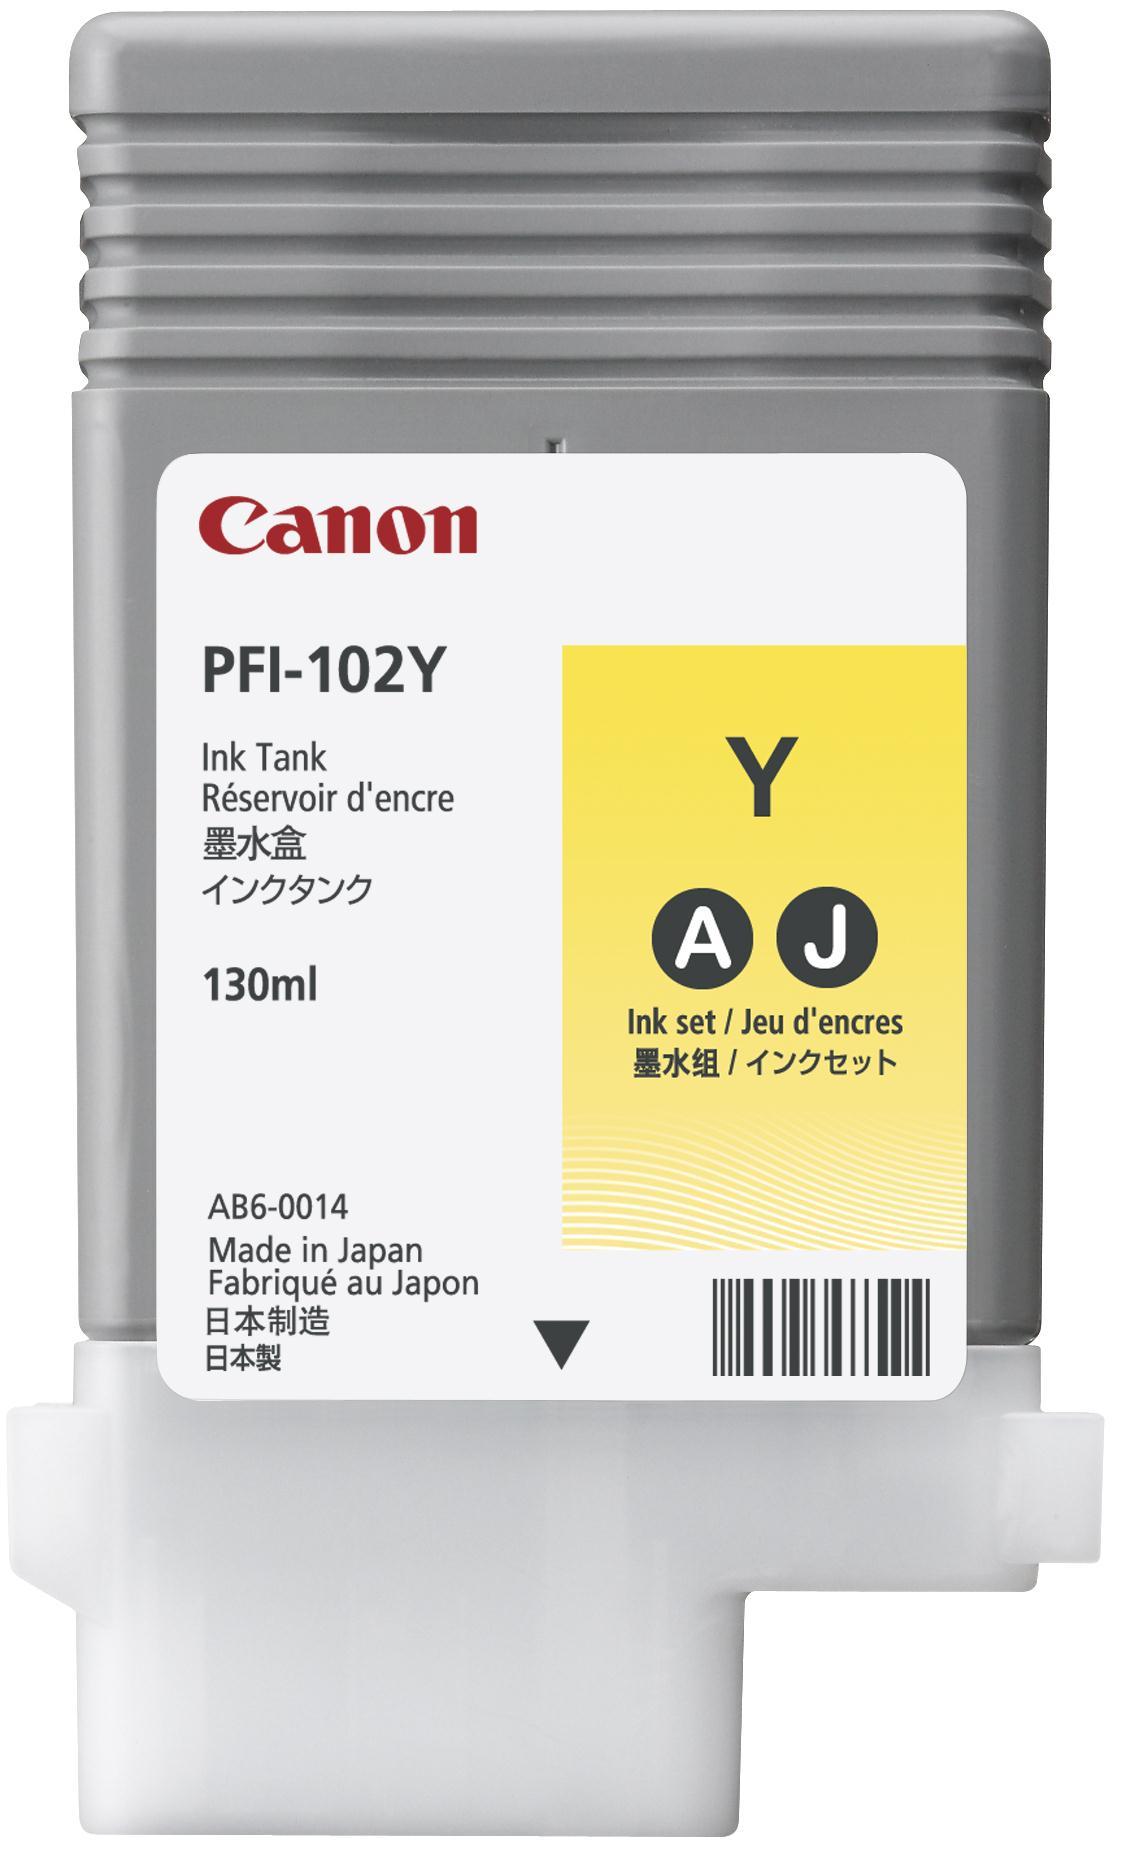 Canon PF1-102Y Ink Tank 130ml Yellow Ref 0898B001AA